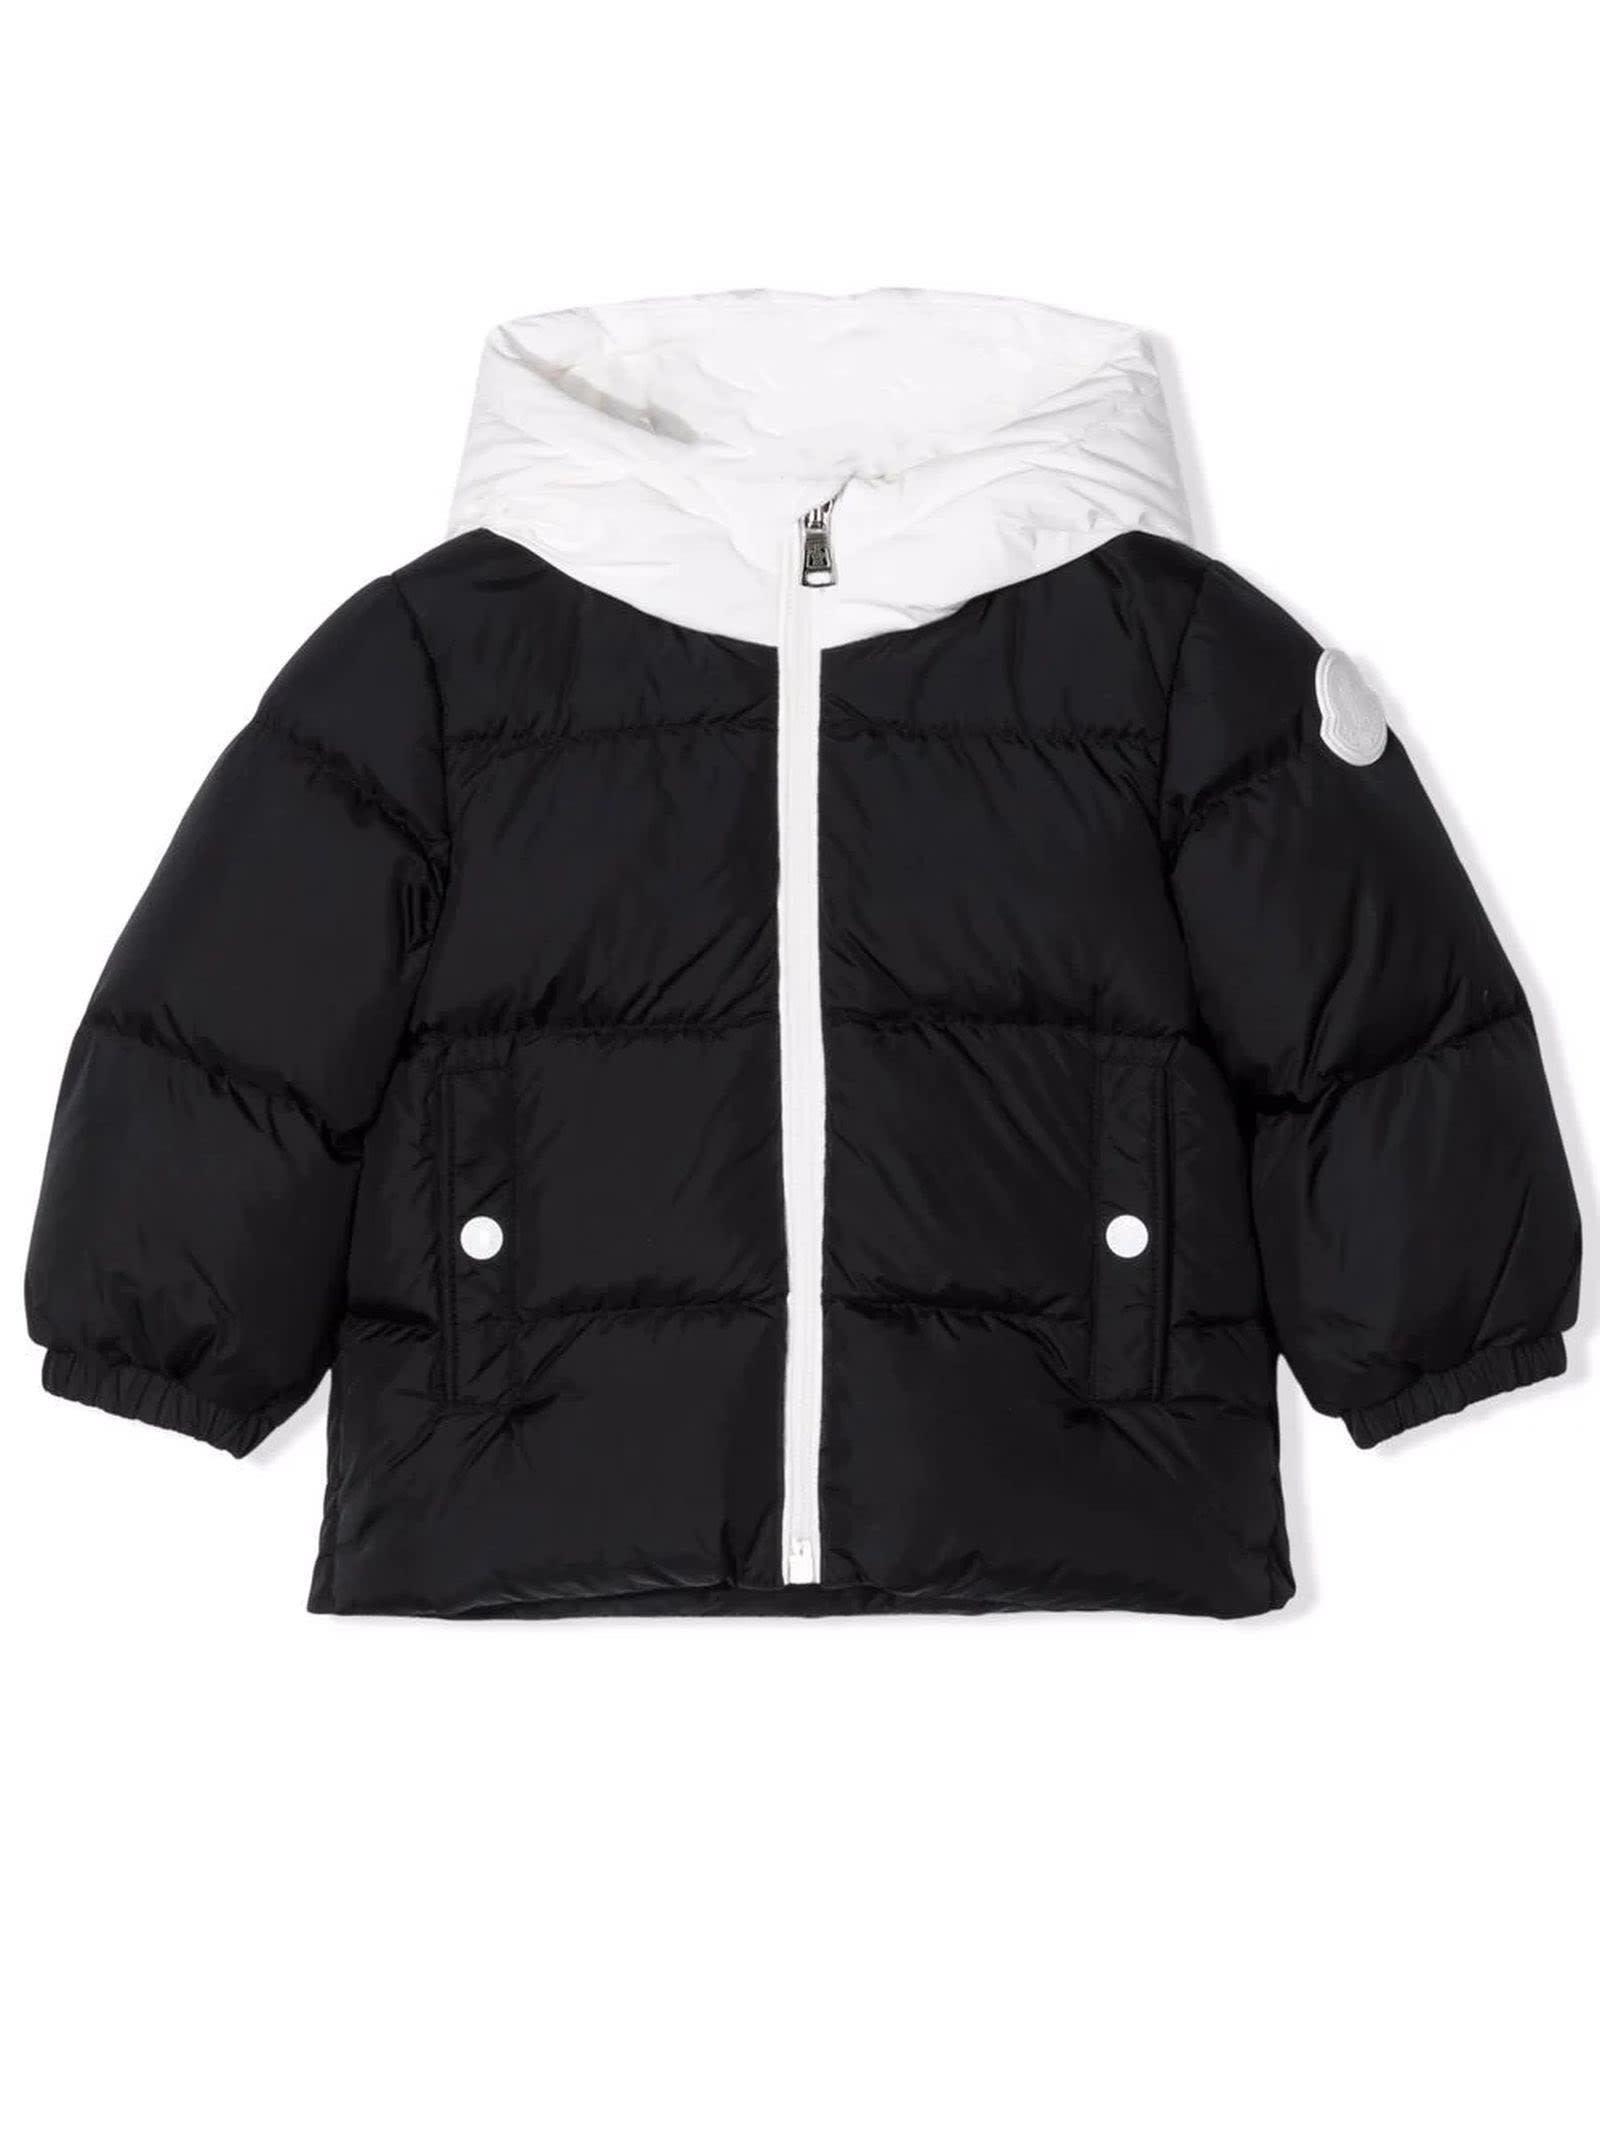 Moncler Black Feather Down Jacket